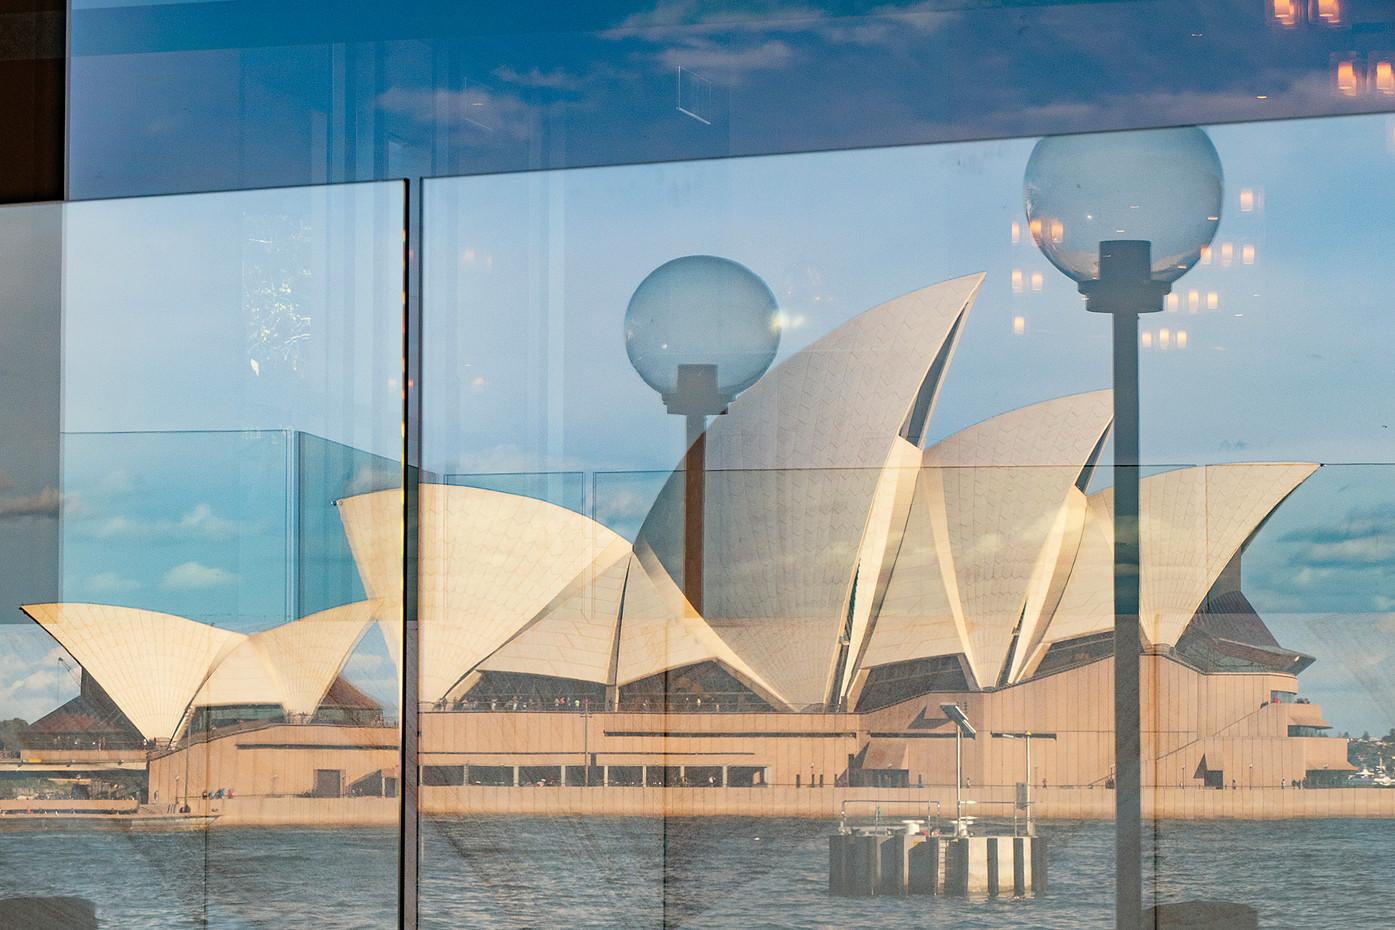 Sydney Opera House reflection, Australia